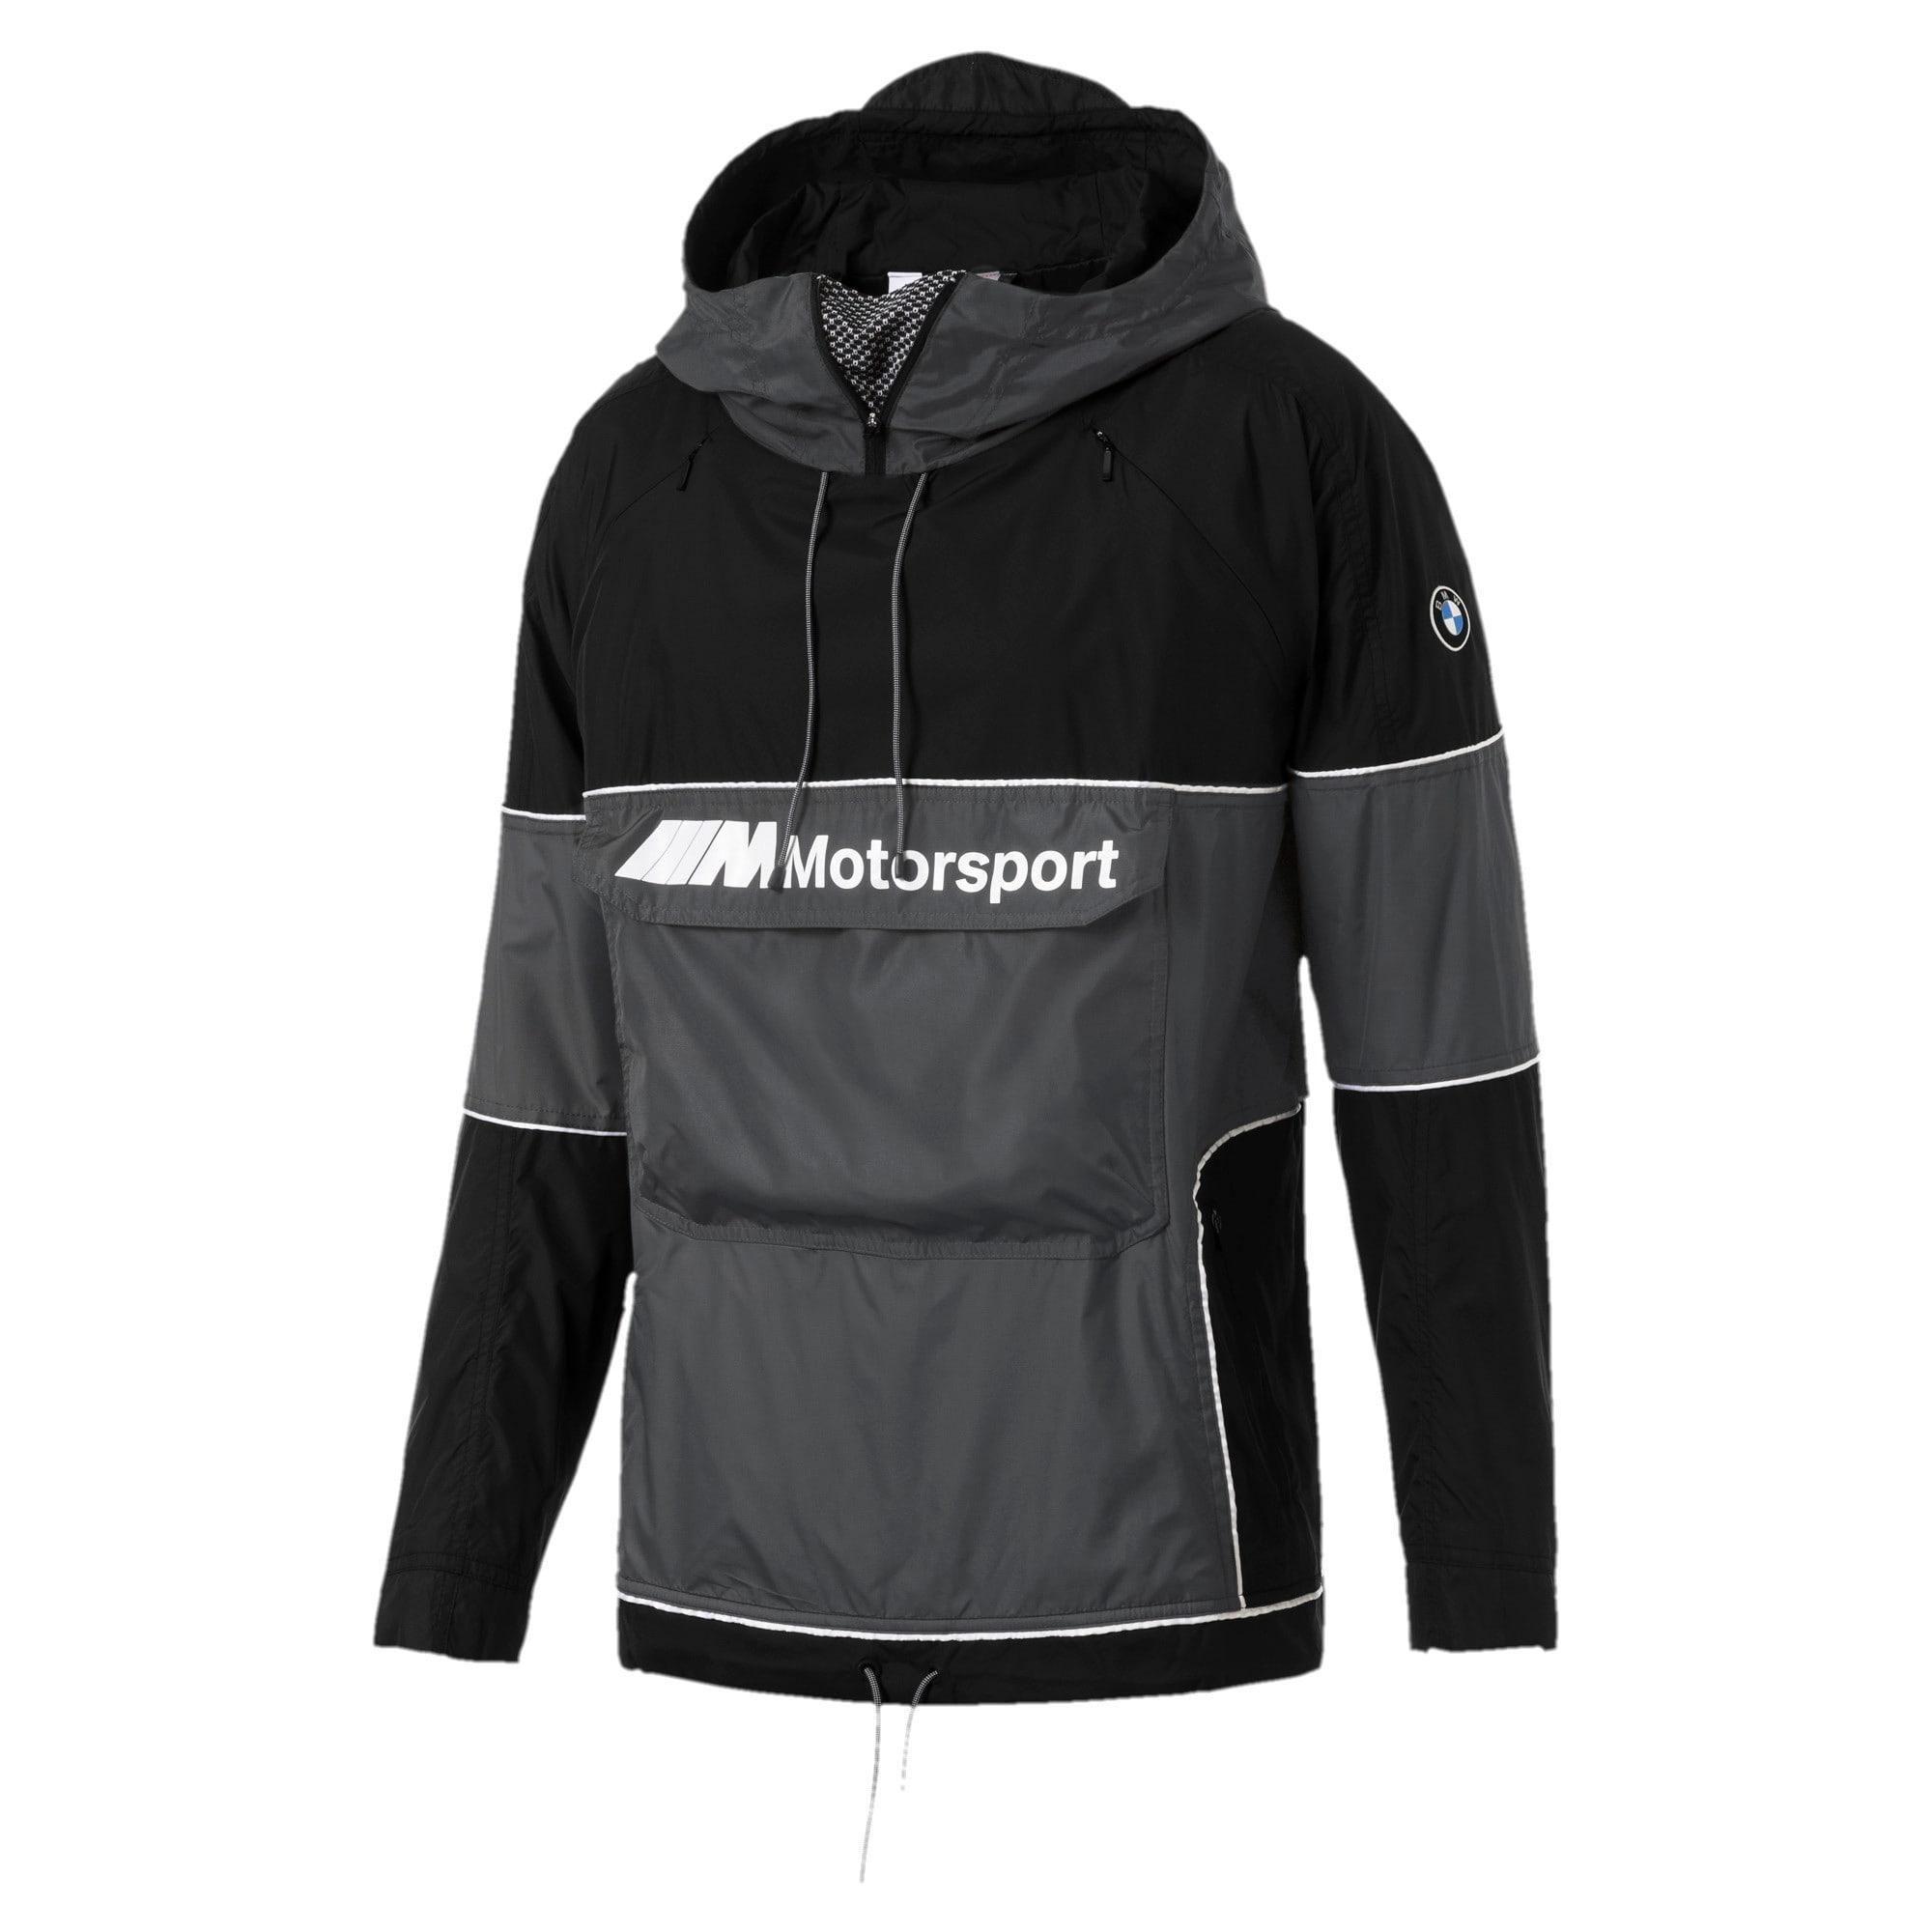 Thumbnail 1 of BMW Motorsport RCT Woven Hooded Men's Jacket, Puma Black, medium